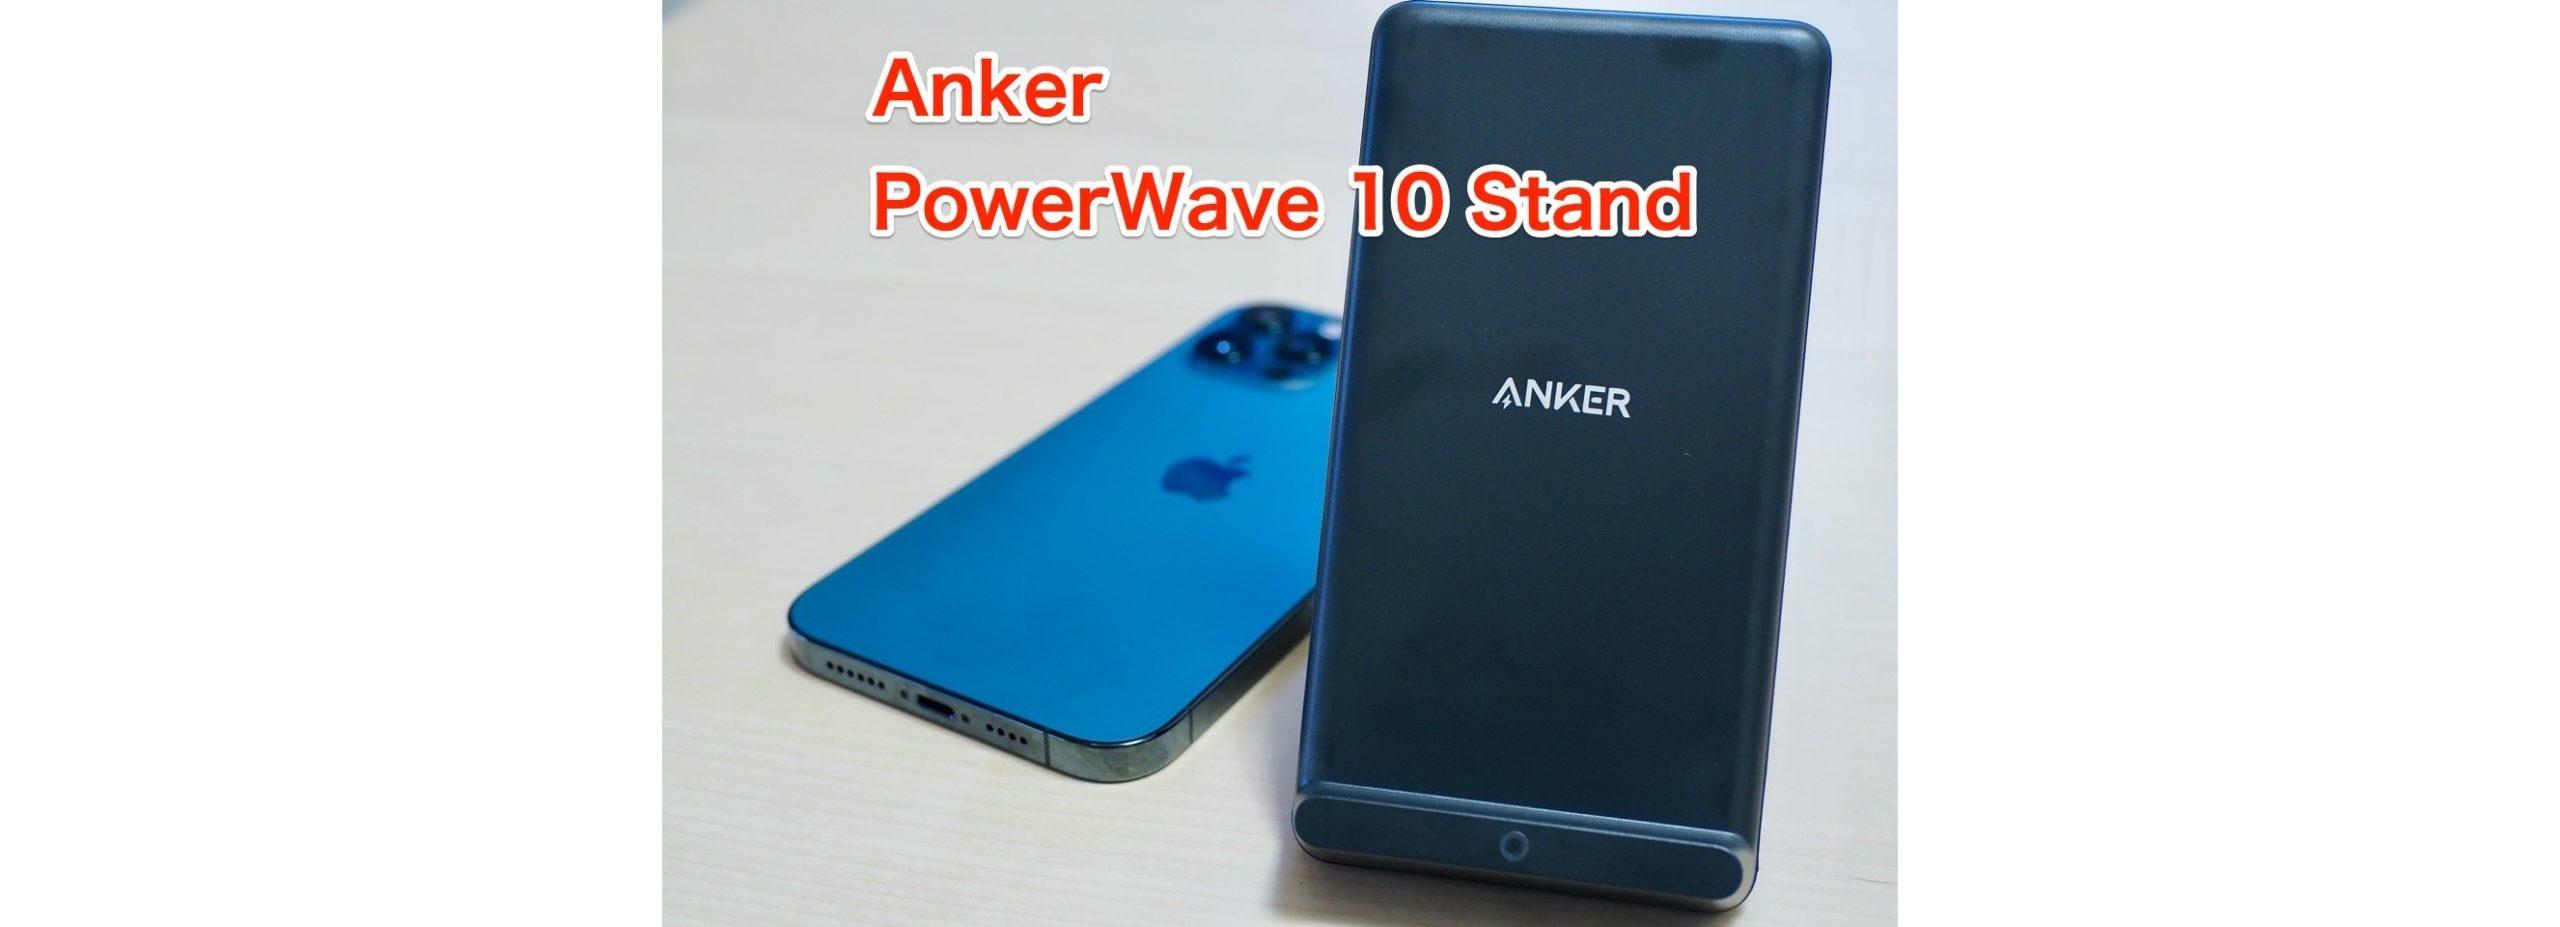 201202-AnkerPowerWave10stand-TOPv2